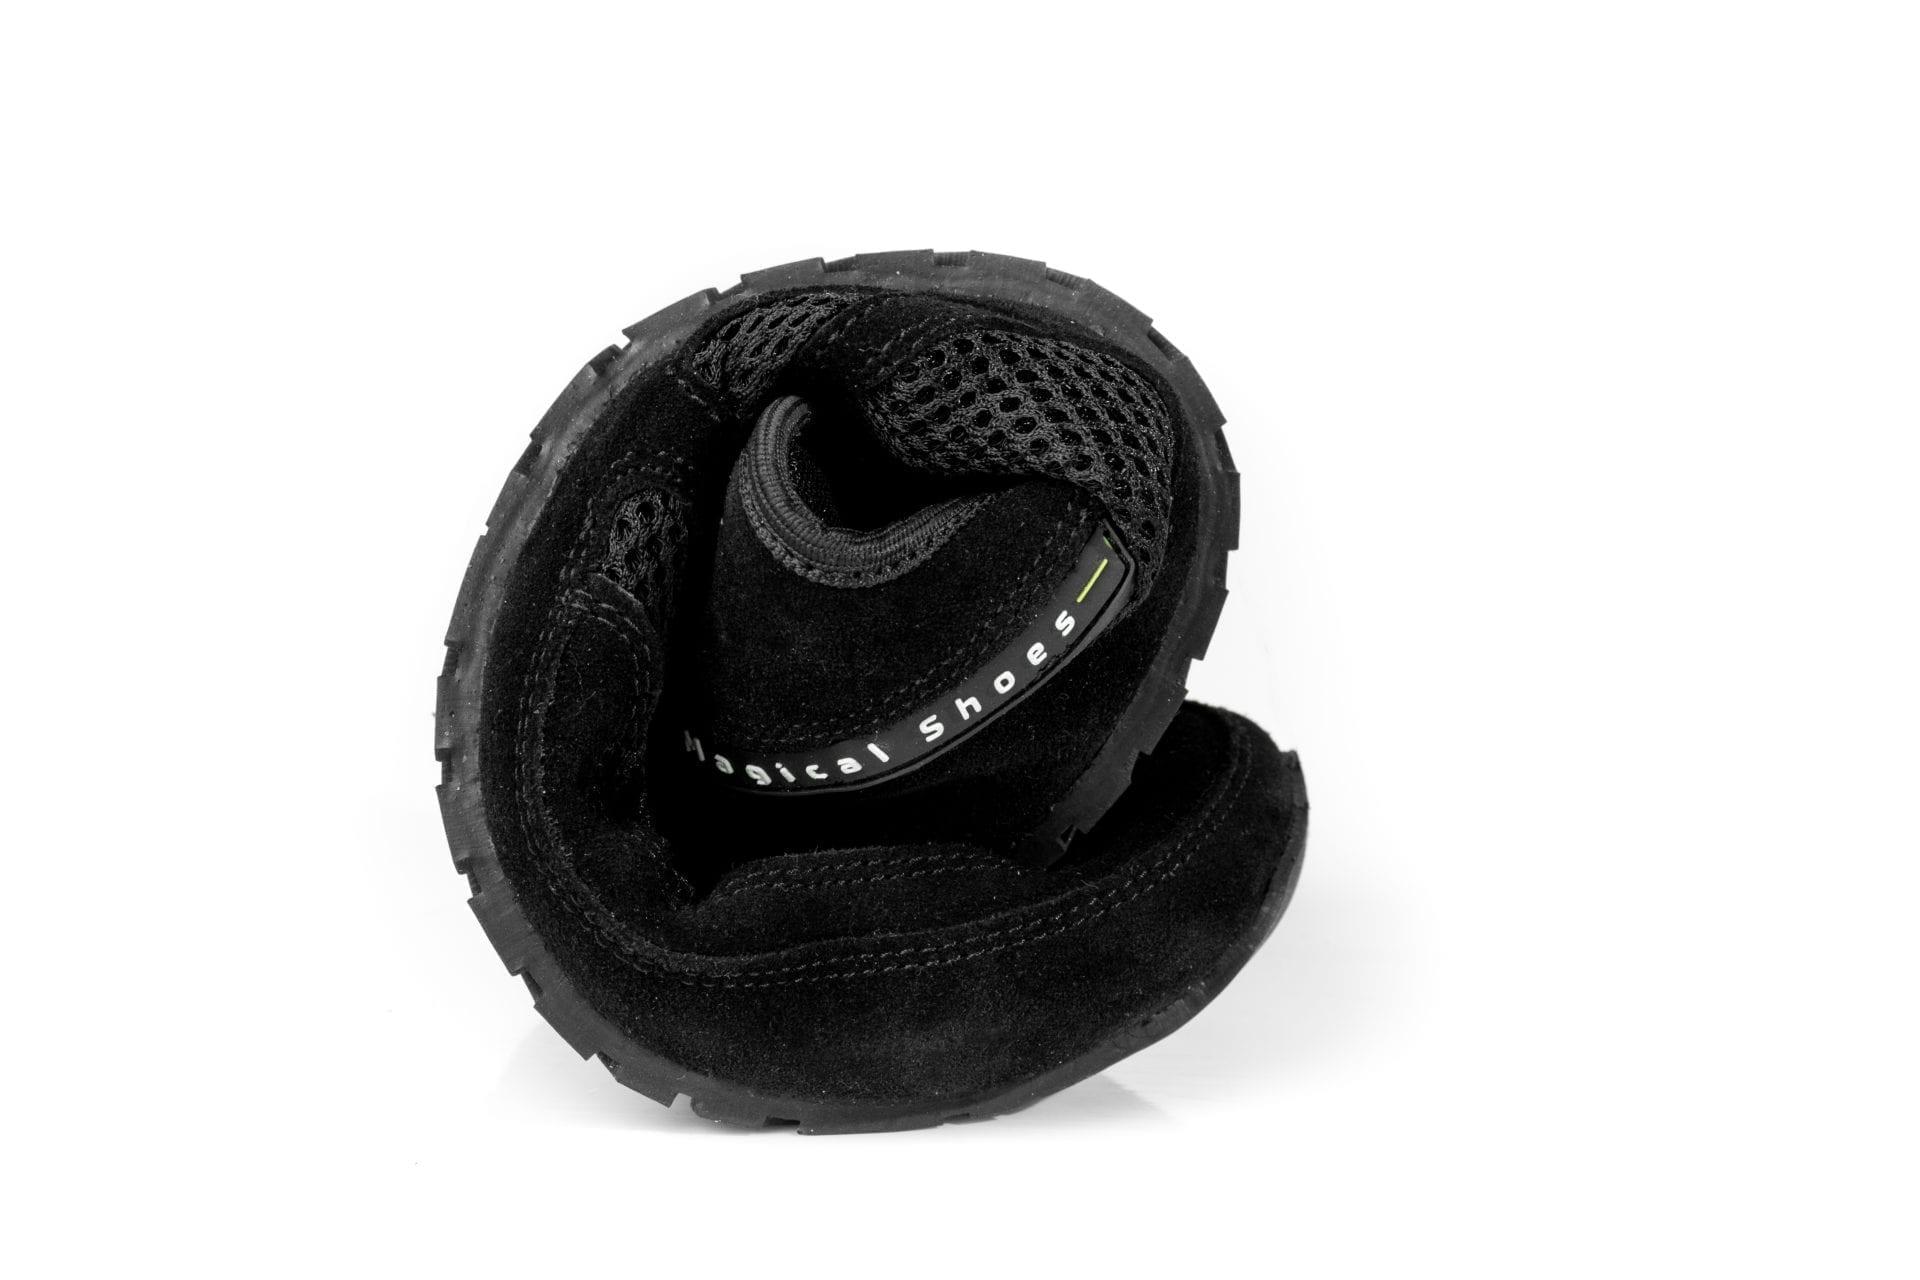 Magical Shoes BAREFOOT SHOES EXPLORER CLASSIC BLACK KIDS picture 3